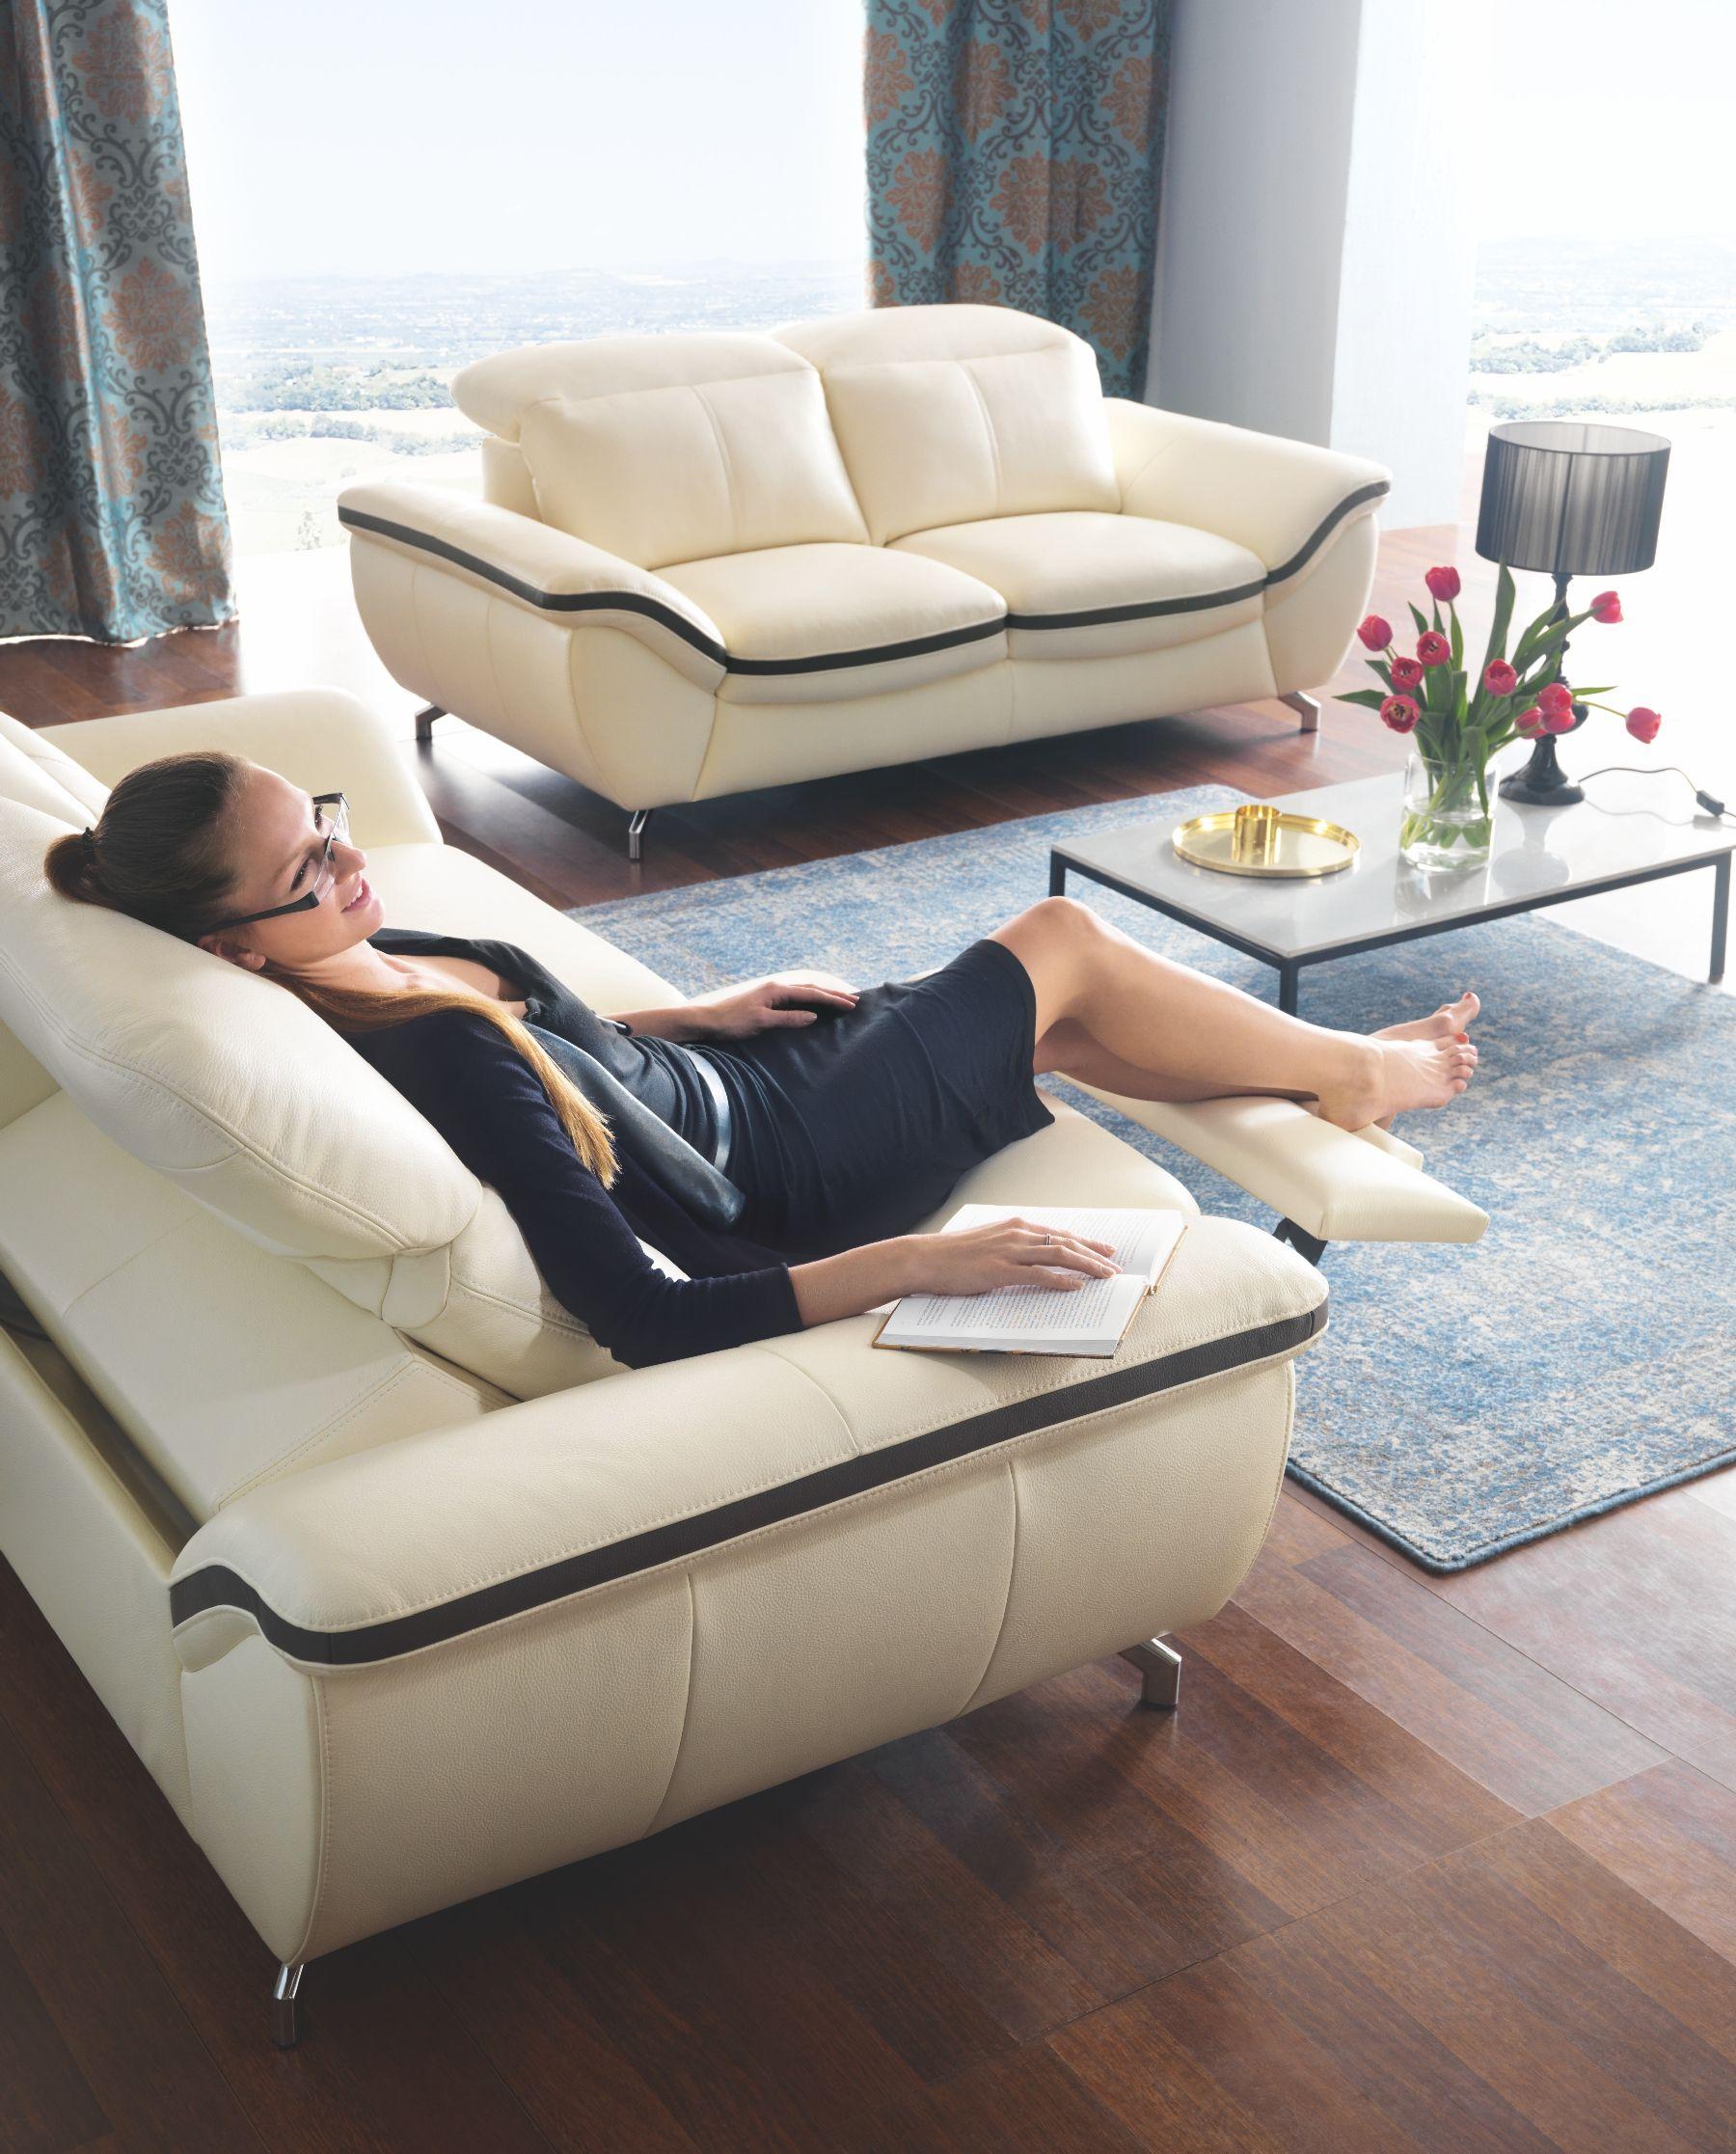 Nowoczesne Sofy I Kanapy Do Salonu Gala Collezione Furniture Leather Reclining Sofa Chaise Sofa